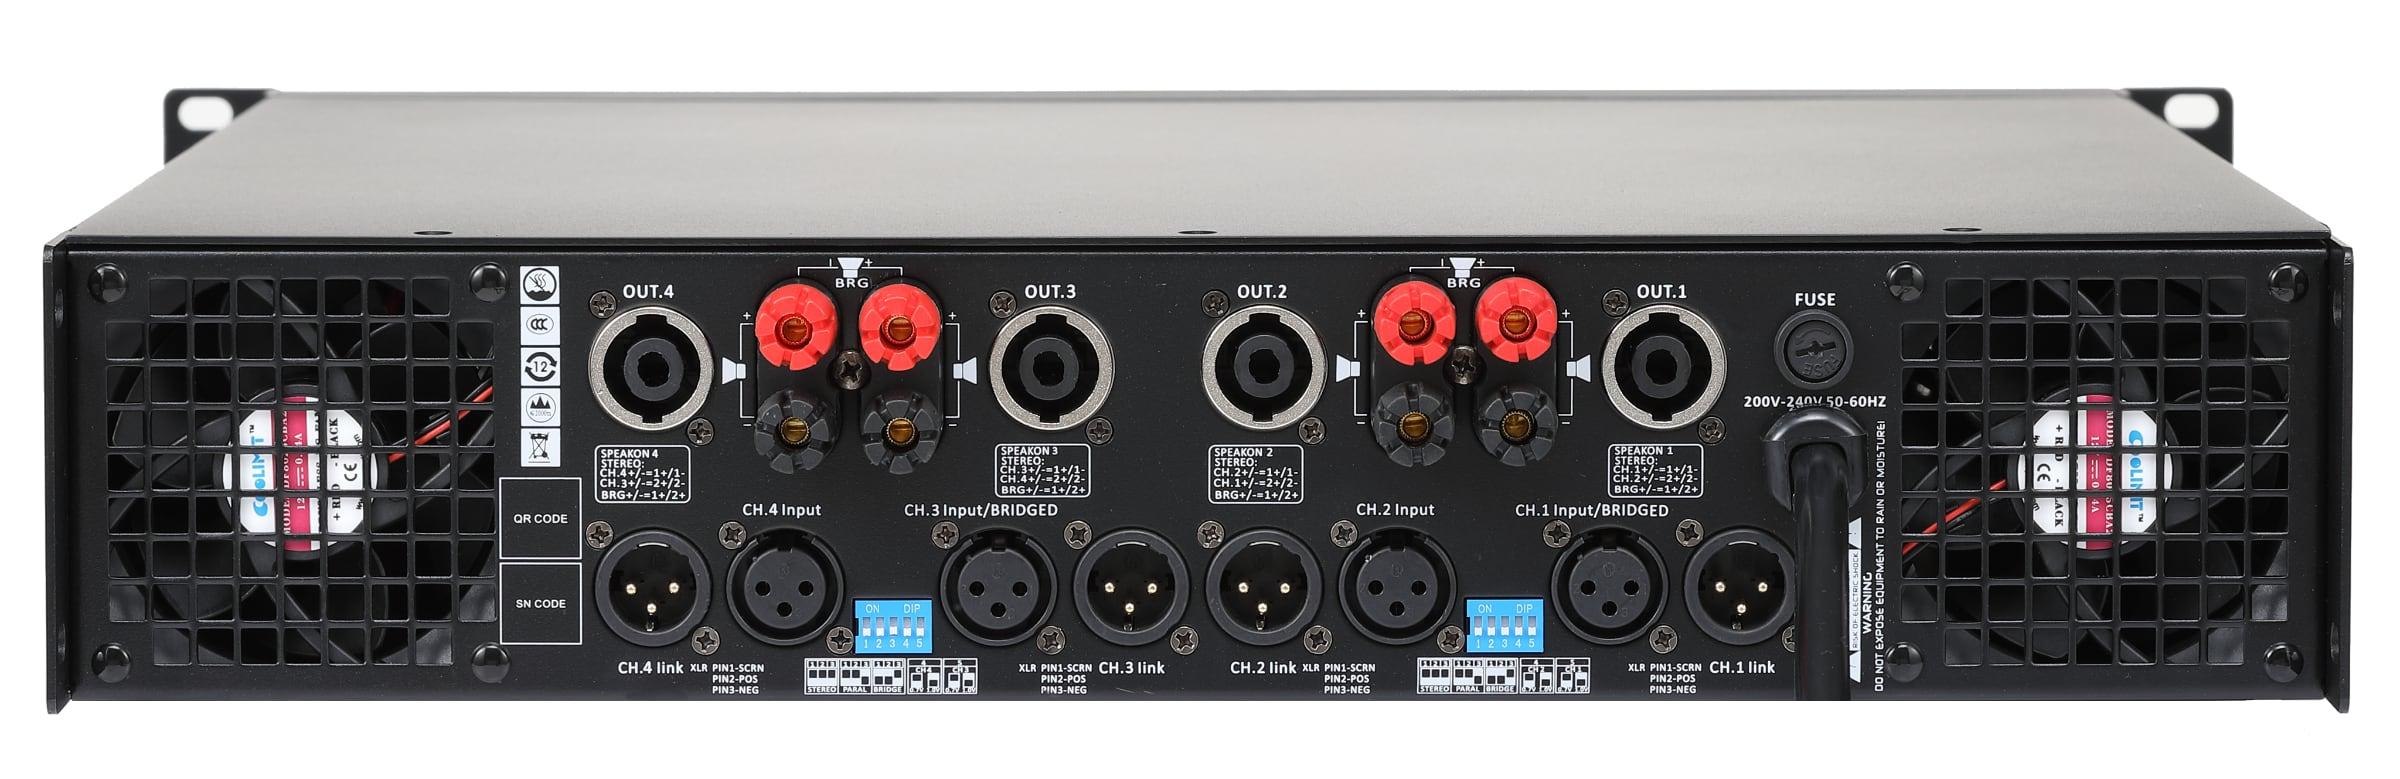 Công suất AAP SU-4600